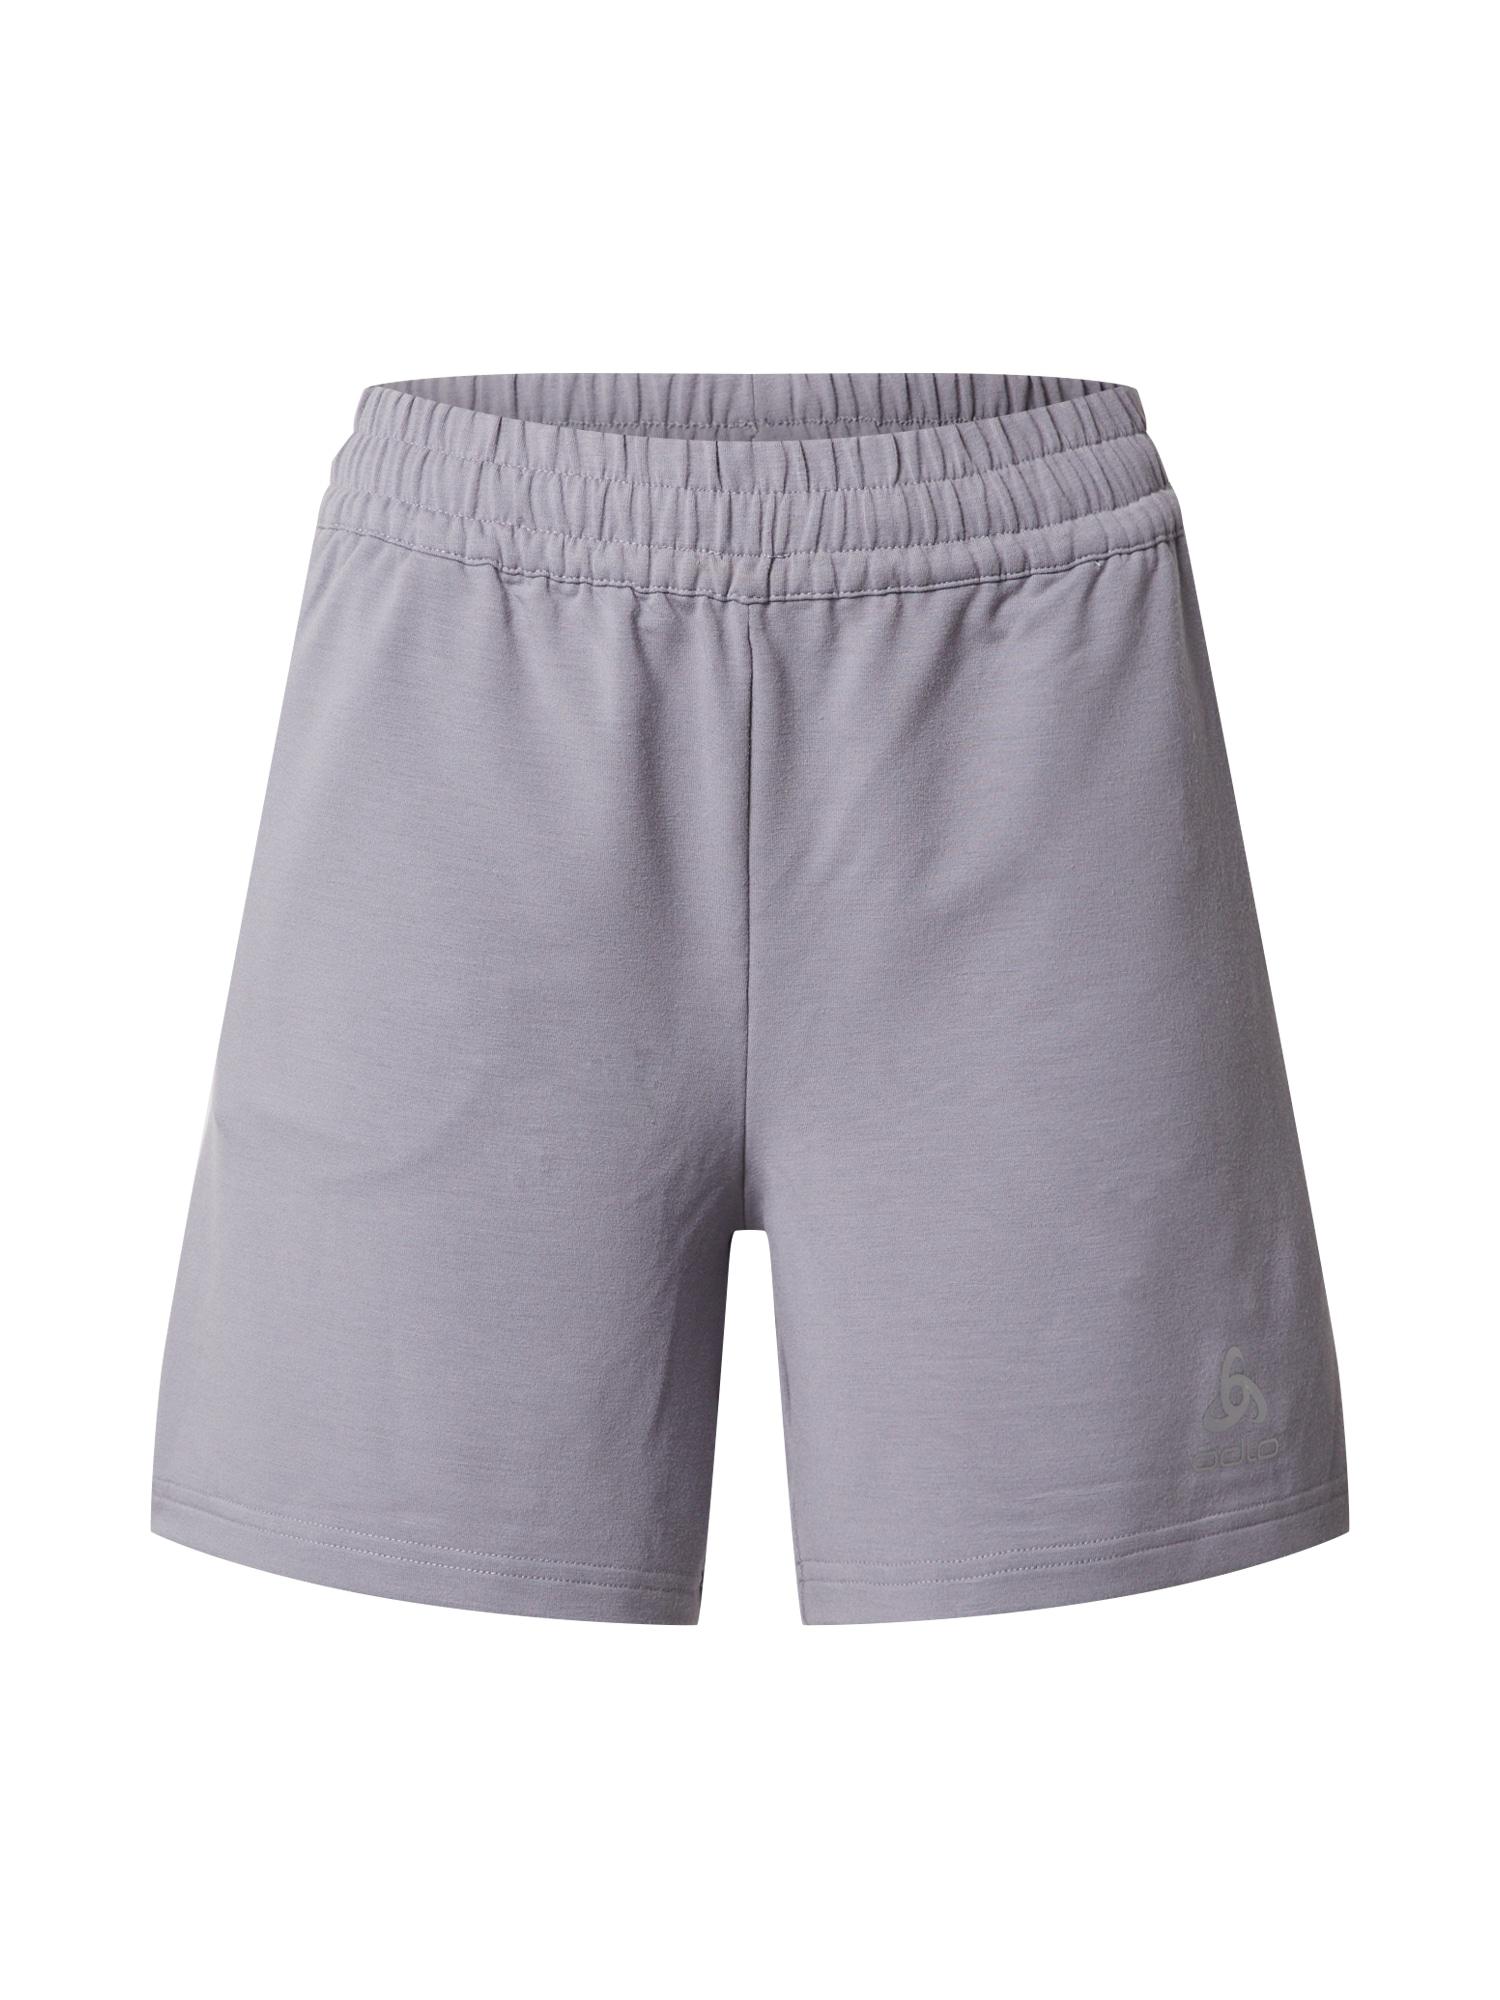 ODLO Sportinės kelnės 'MILLENNIUM ELEMENT' pilka